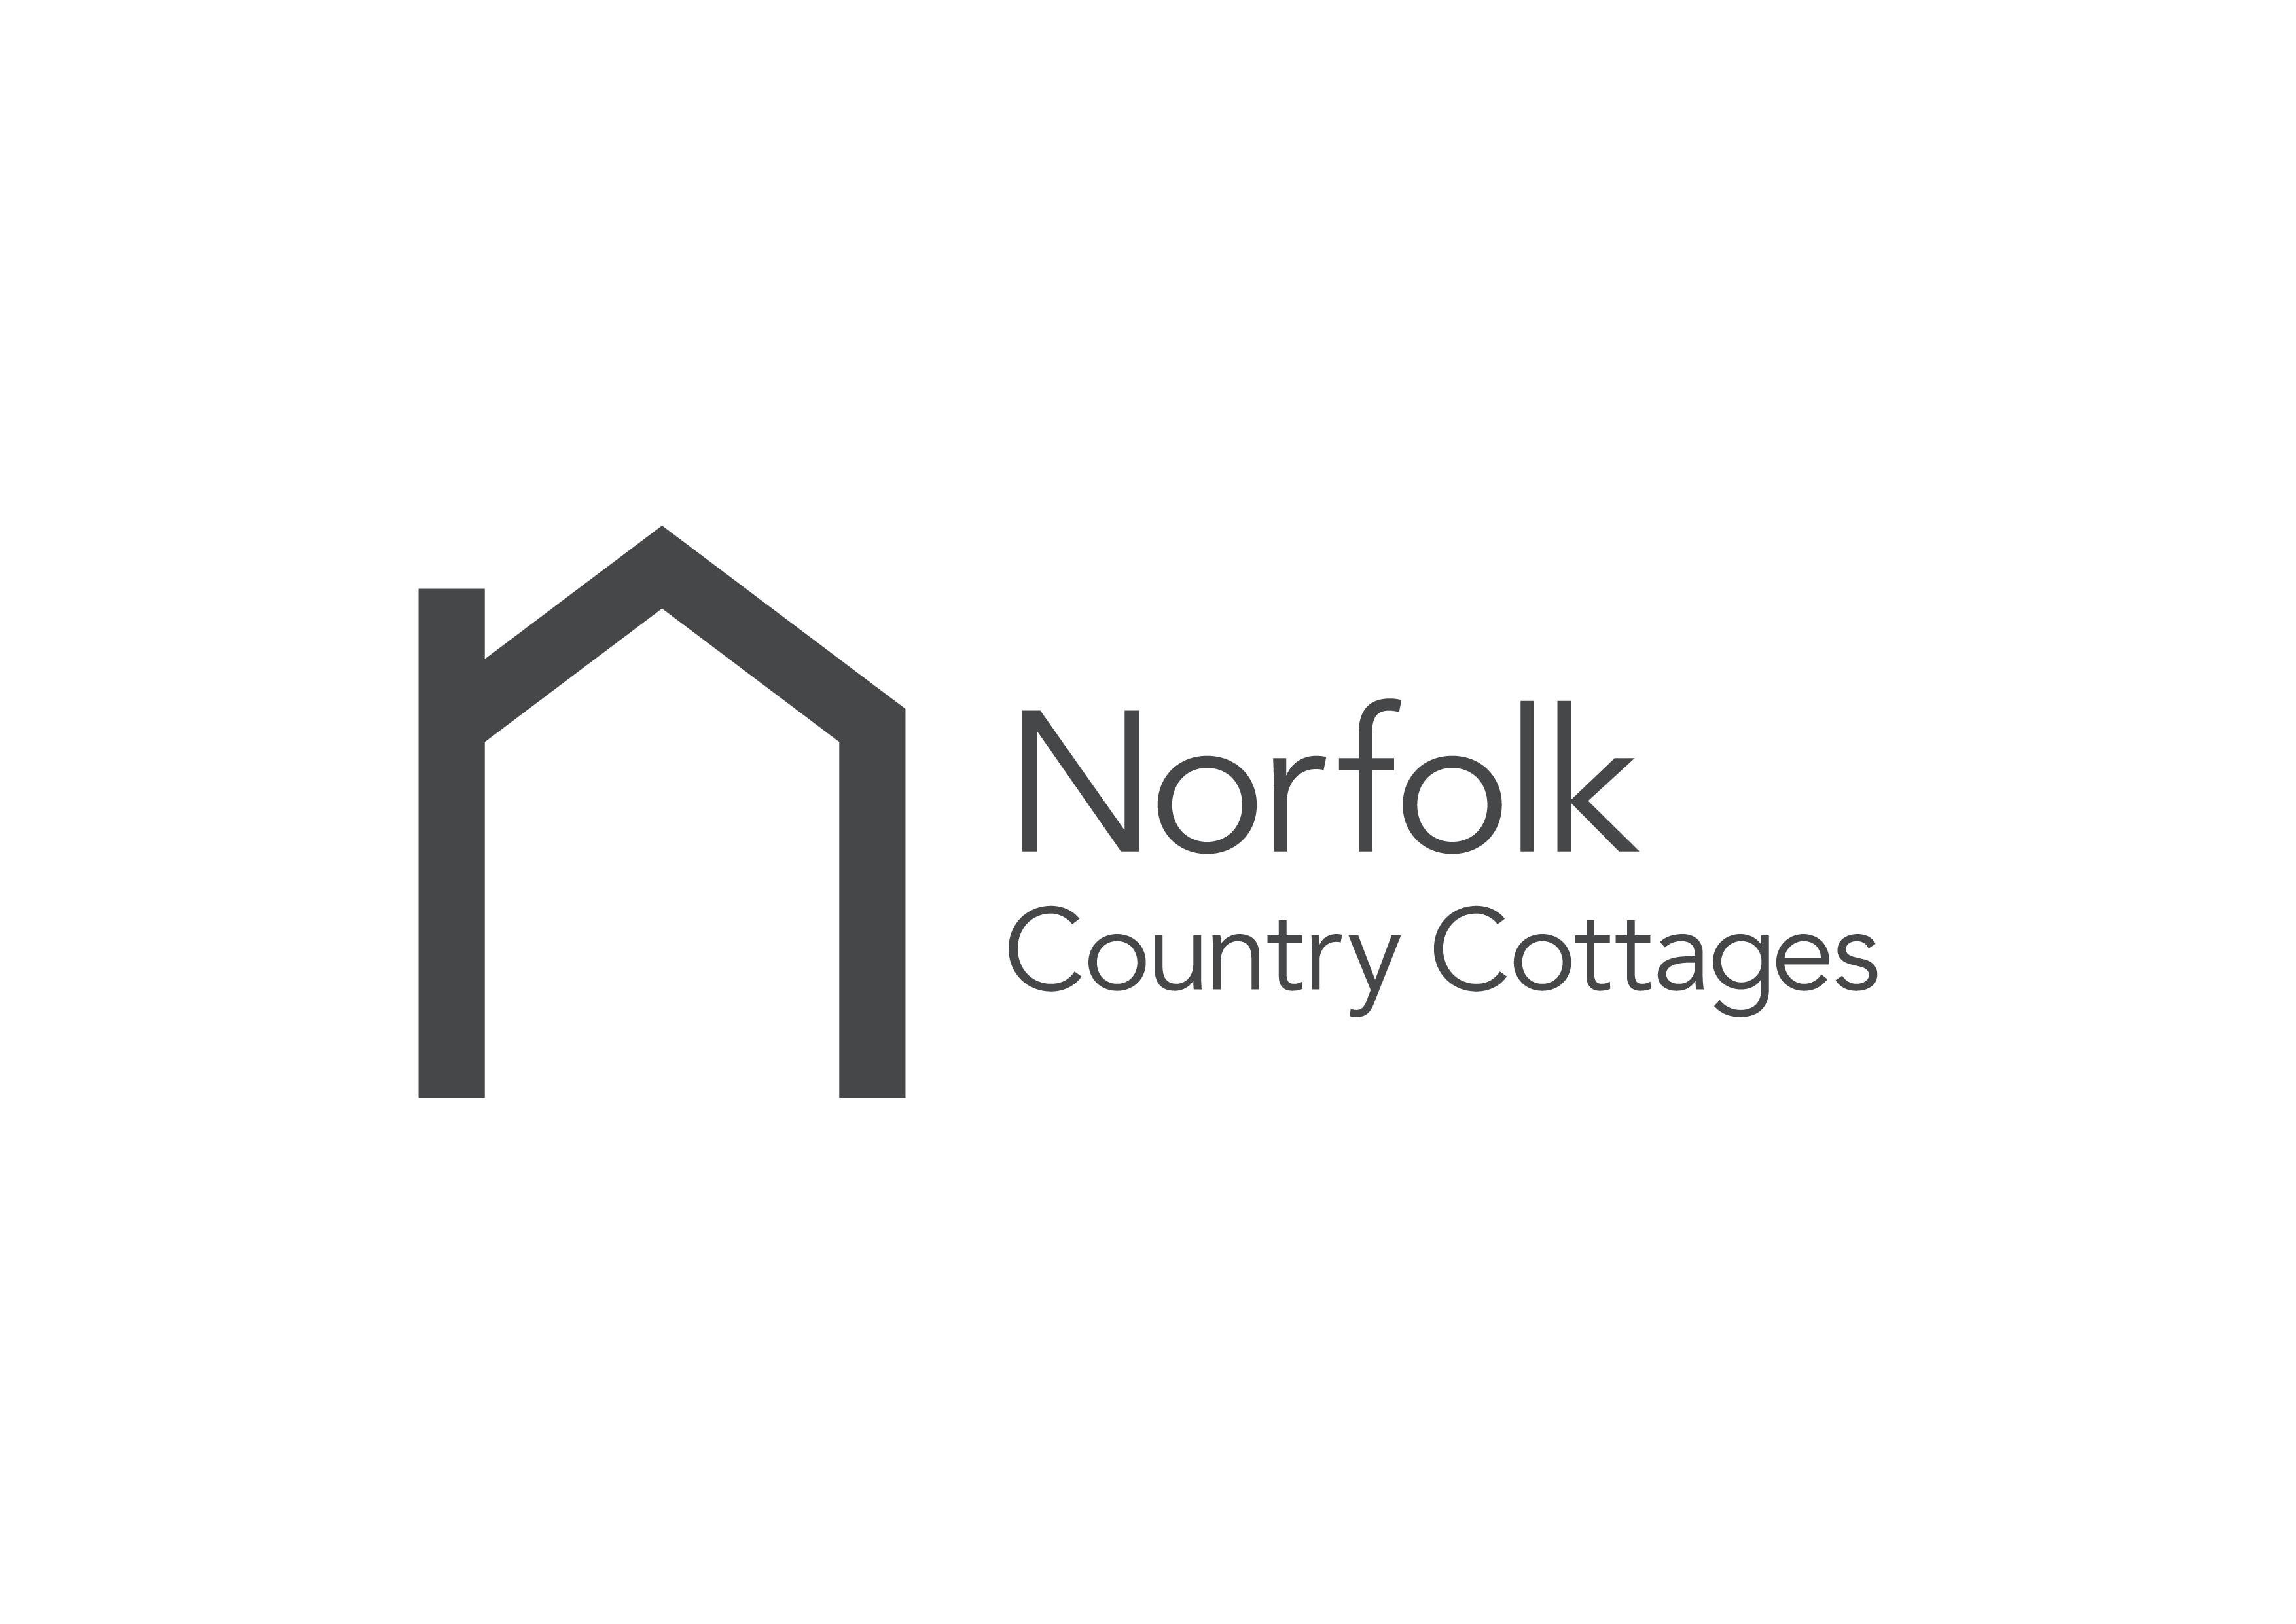 The Original Cottage Company